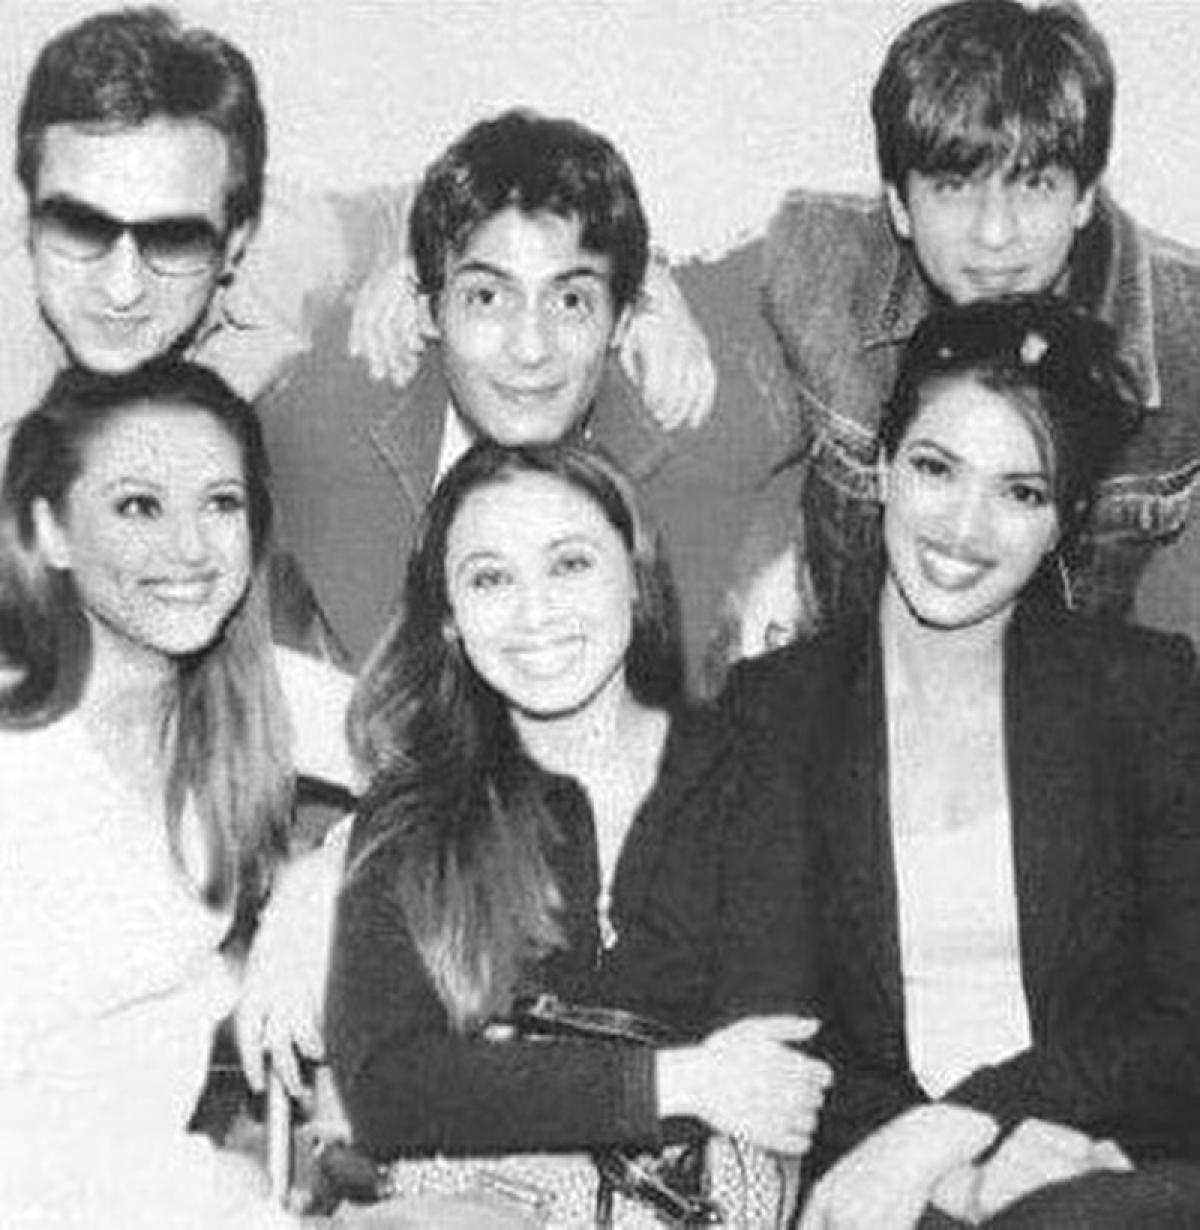 Preity Zinta's throwback pic with SRK, Saif, Rani and Priyanka will make you nostalgic